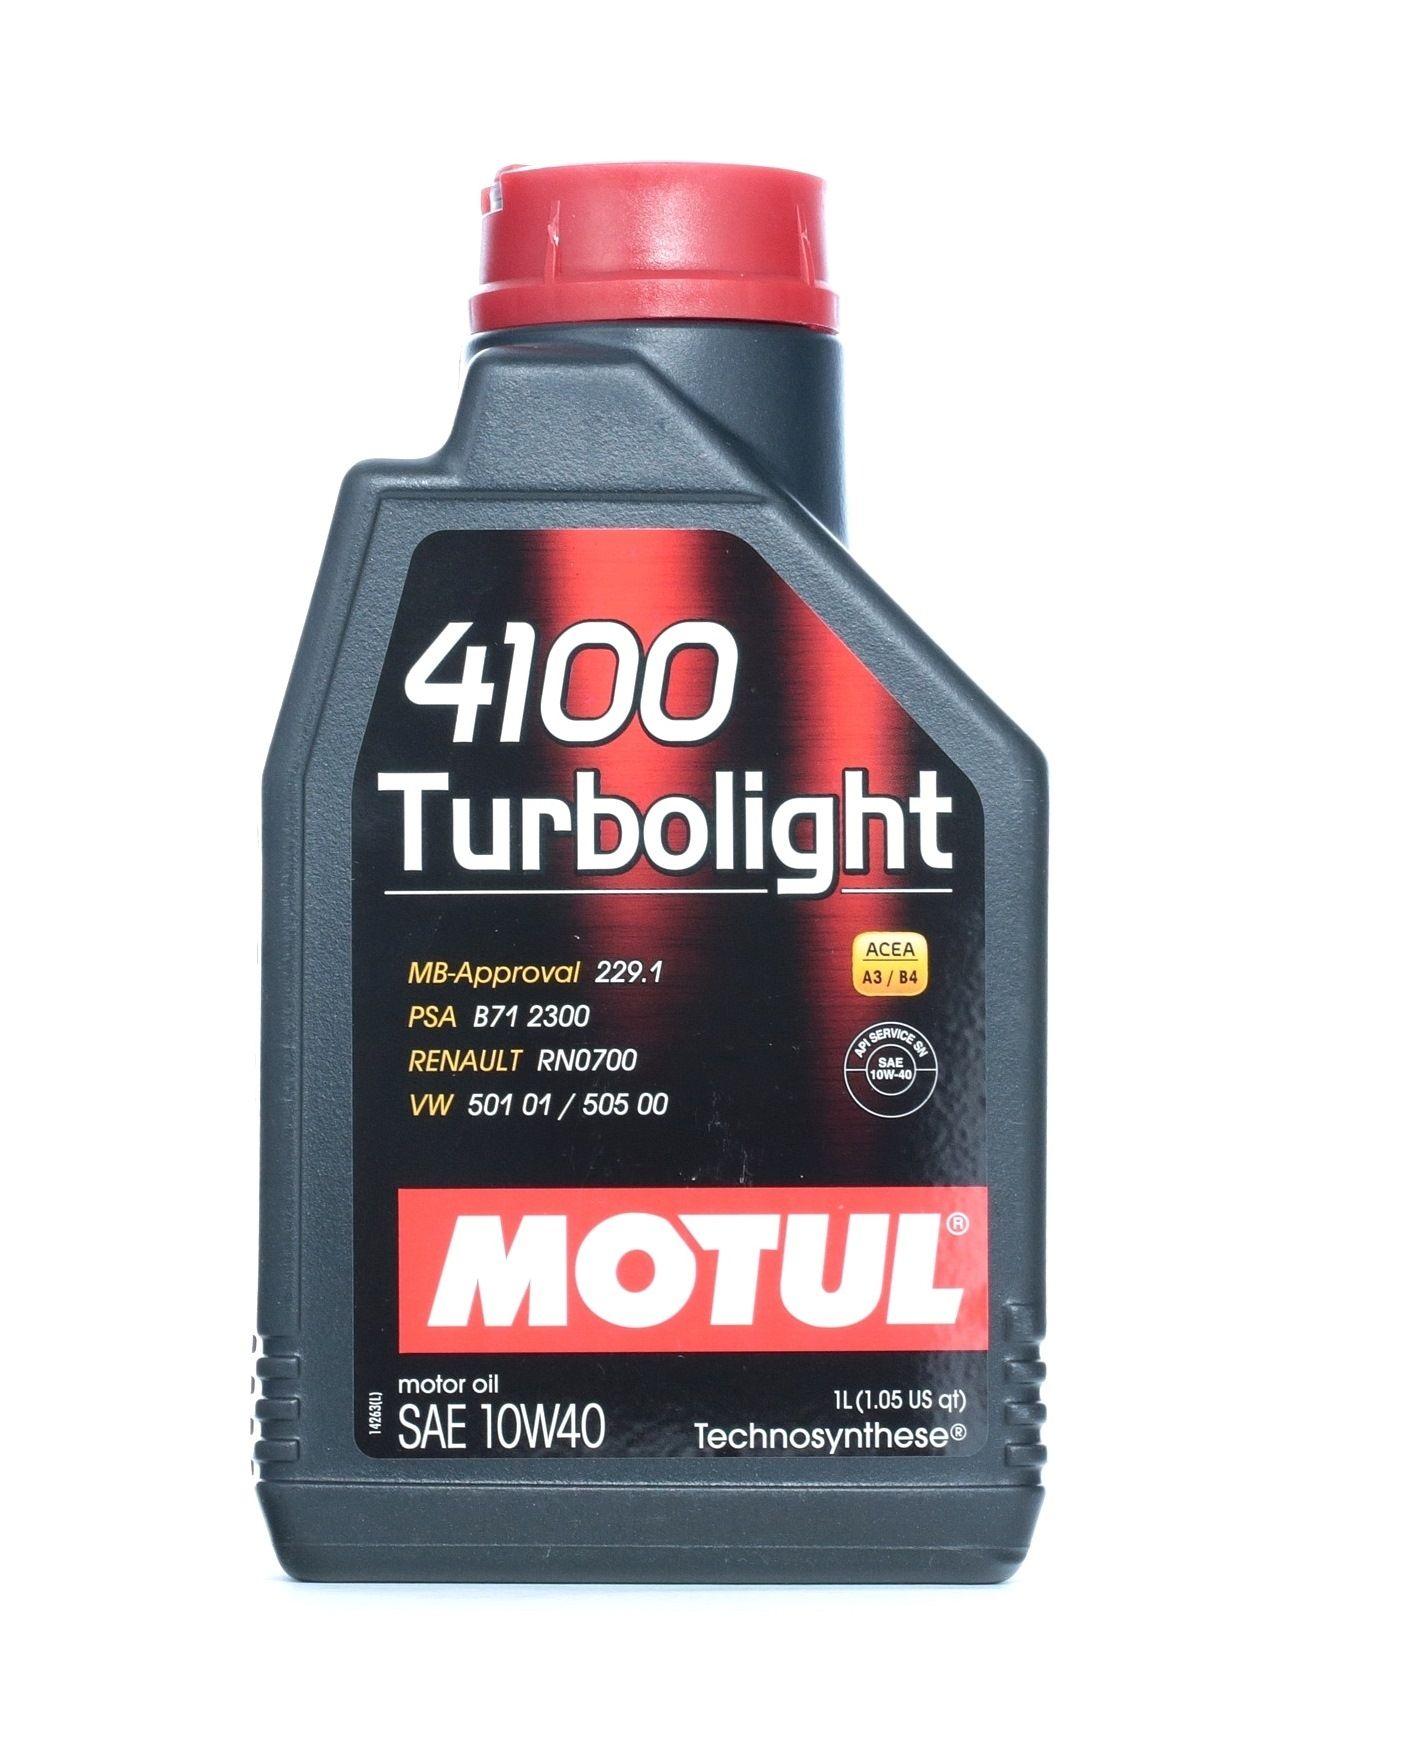 4100TURBOLIGHT10W40 MOTUL TURBOLIGHT 10W-40, 1l, Teilsynthetiköl Motoröl 102774 günstig kaufen